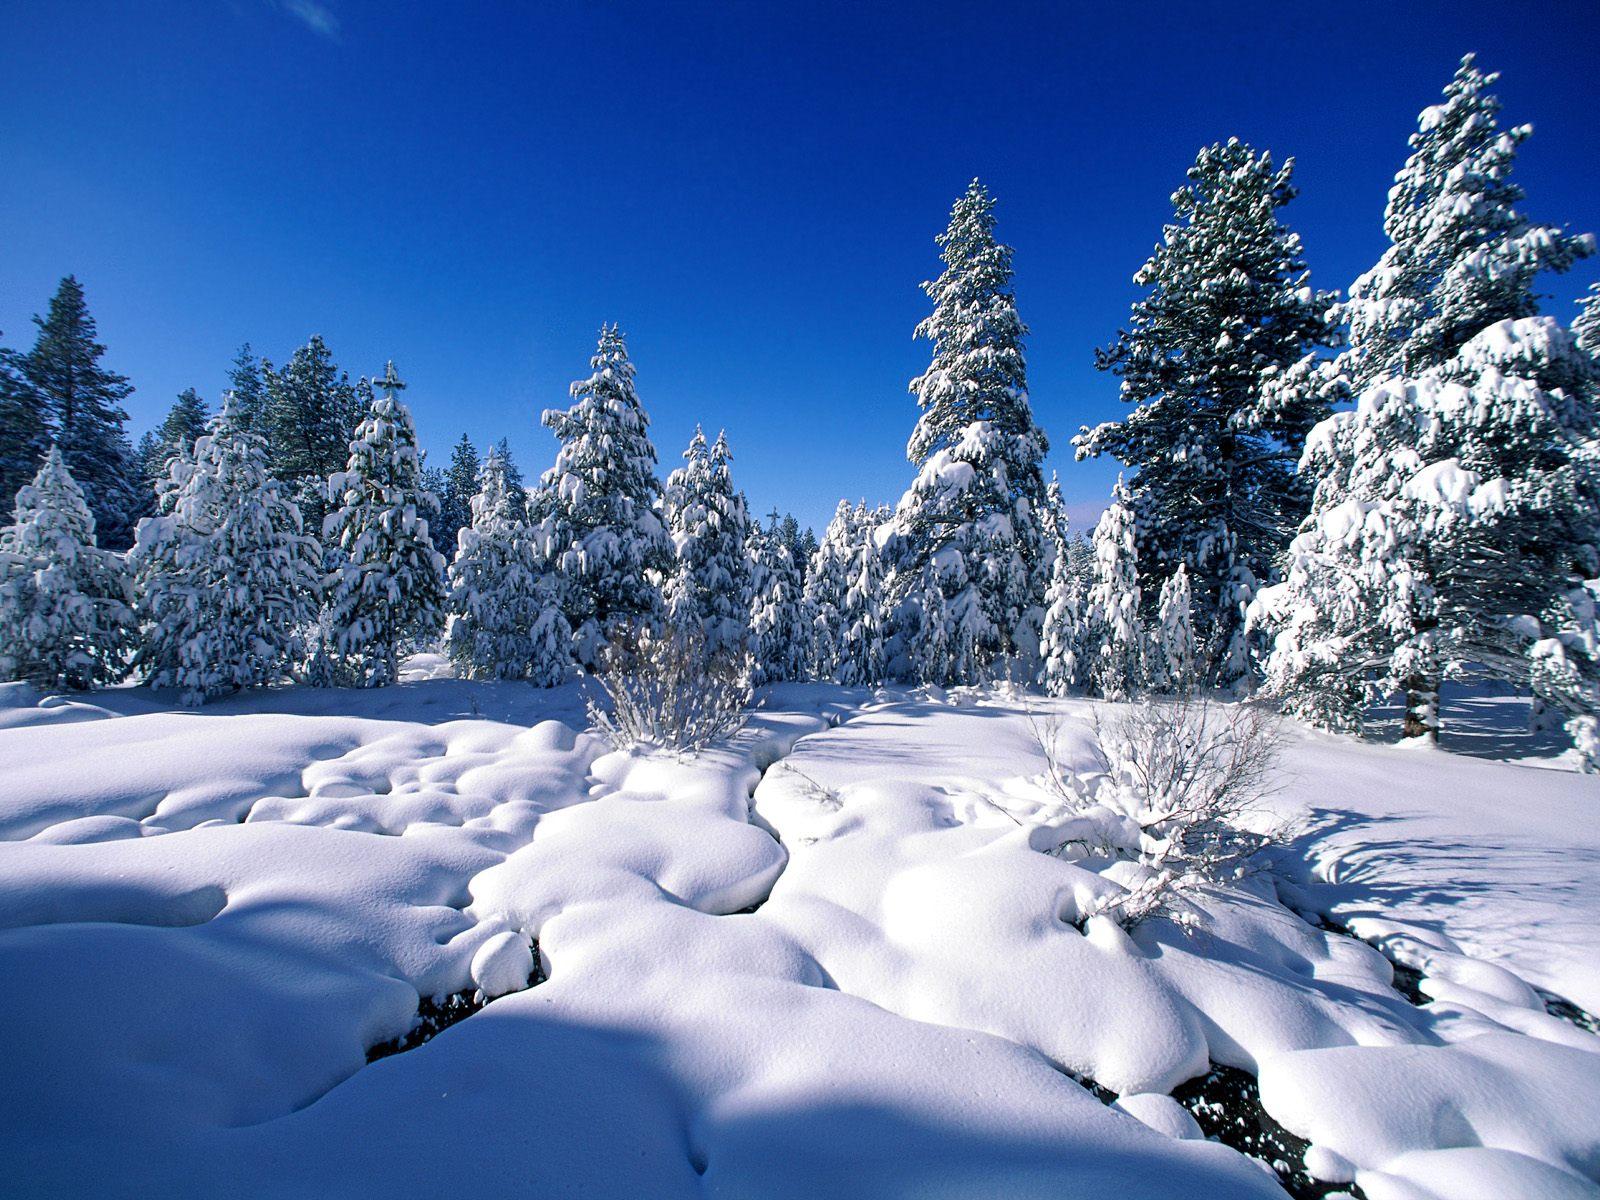 Winter snowwinter wallpaperwallpaper snow 6 High Definition 1600x1200